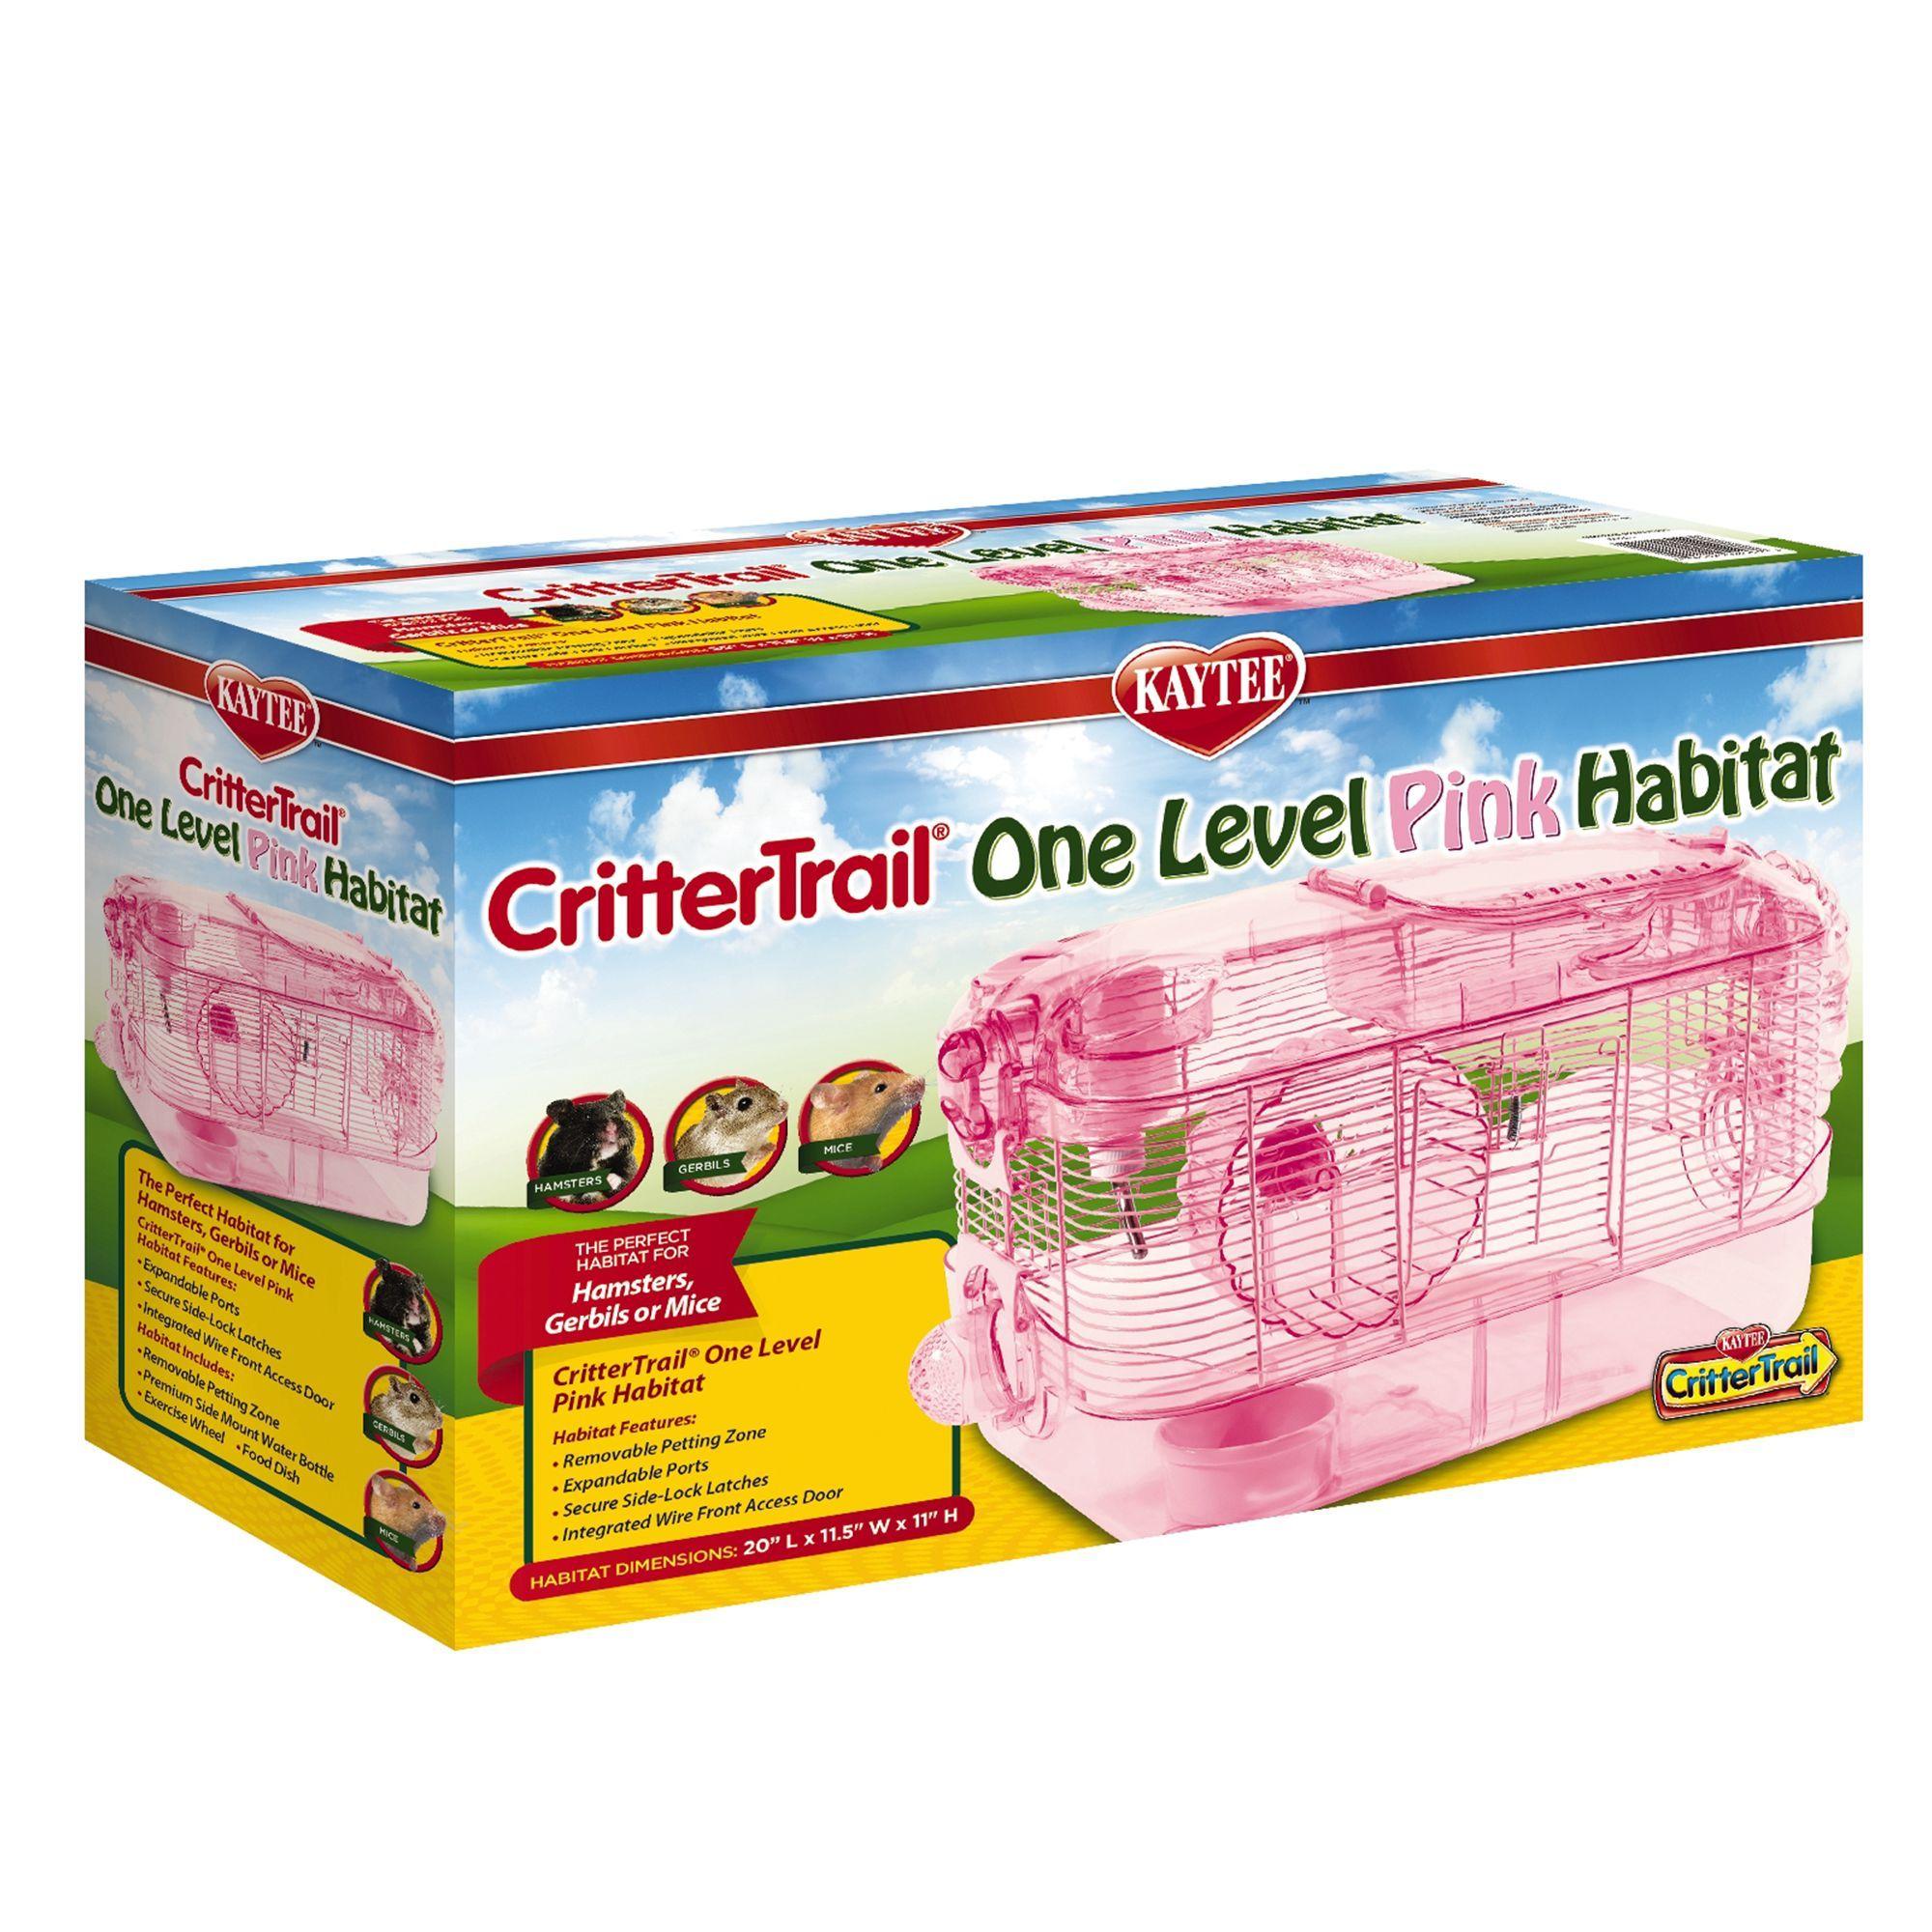 Kaytee Crittertrail One Level Pink Habitat Small Pets Habitats Pet Spray